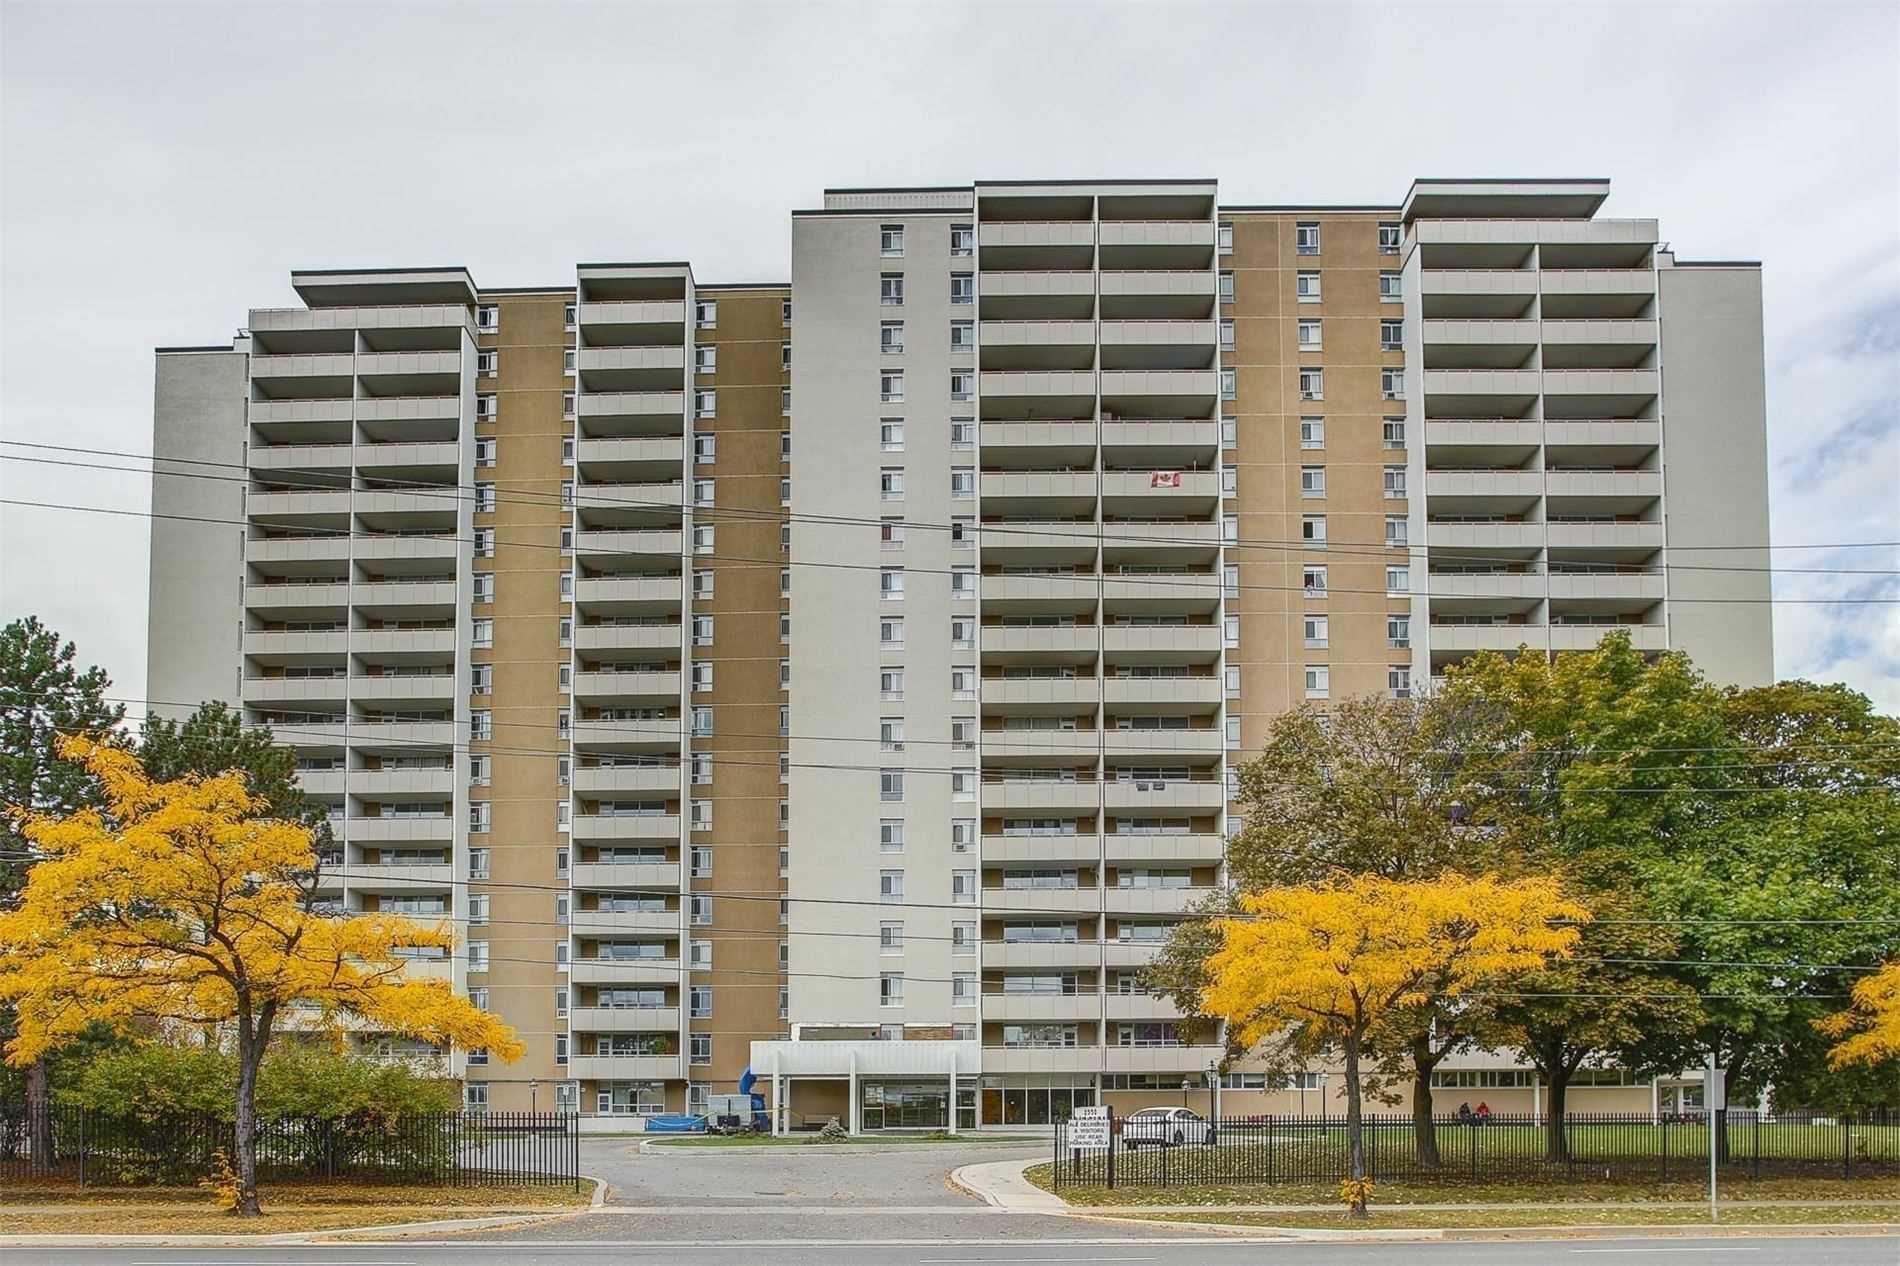 Main Photo: 1602 2550 Pharmacy Avenue in Toronto: L'Amoreaux Condo for sale (Toronto E05)  : MLS®# E5079345